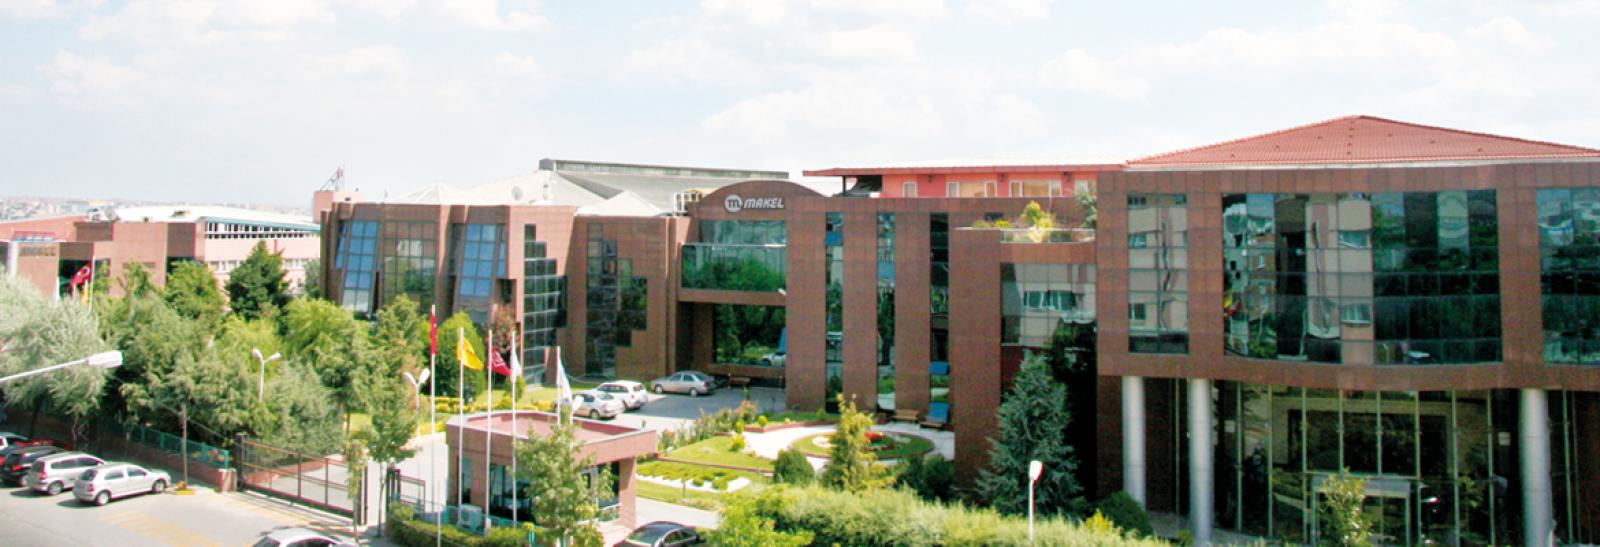 Makel Fabrikası